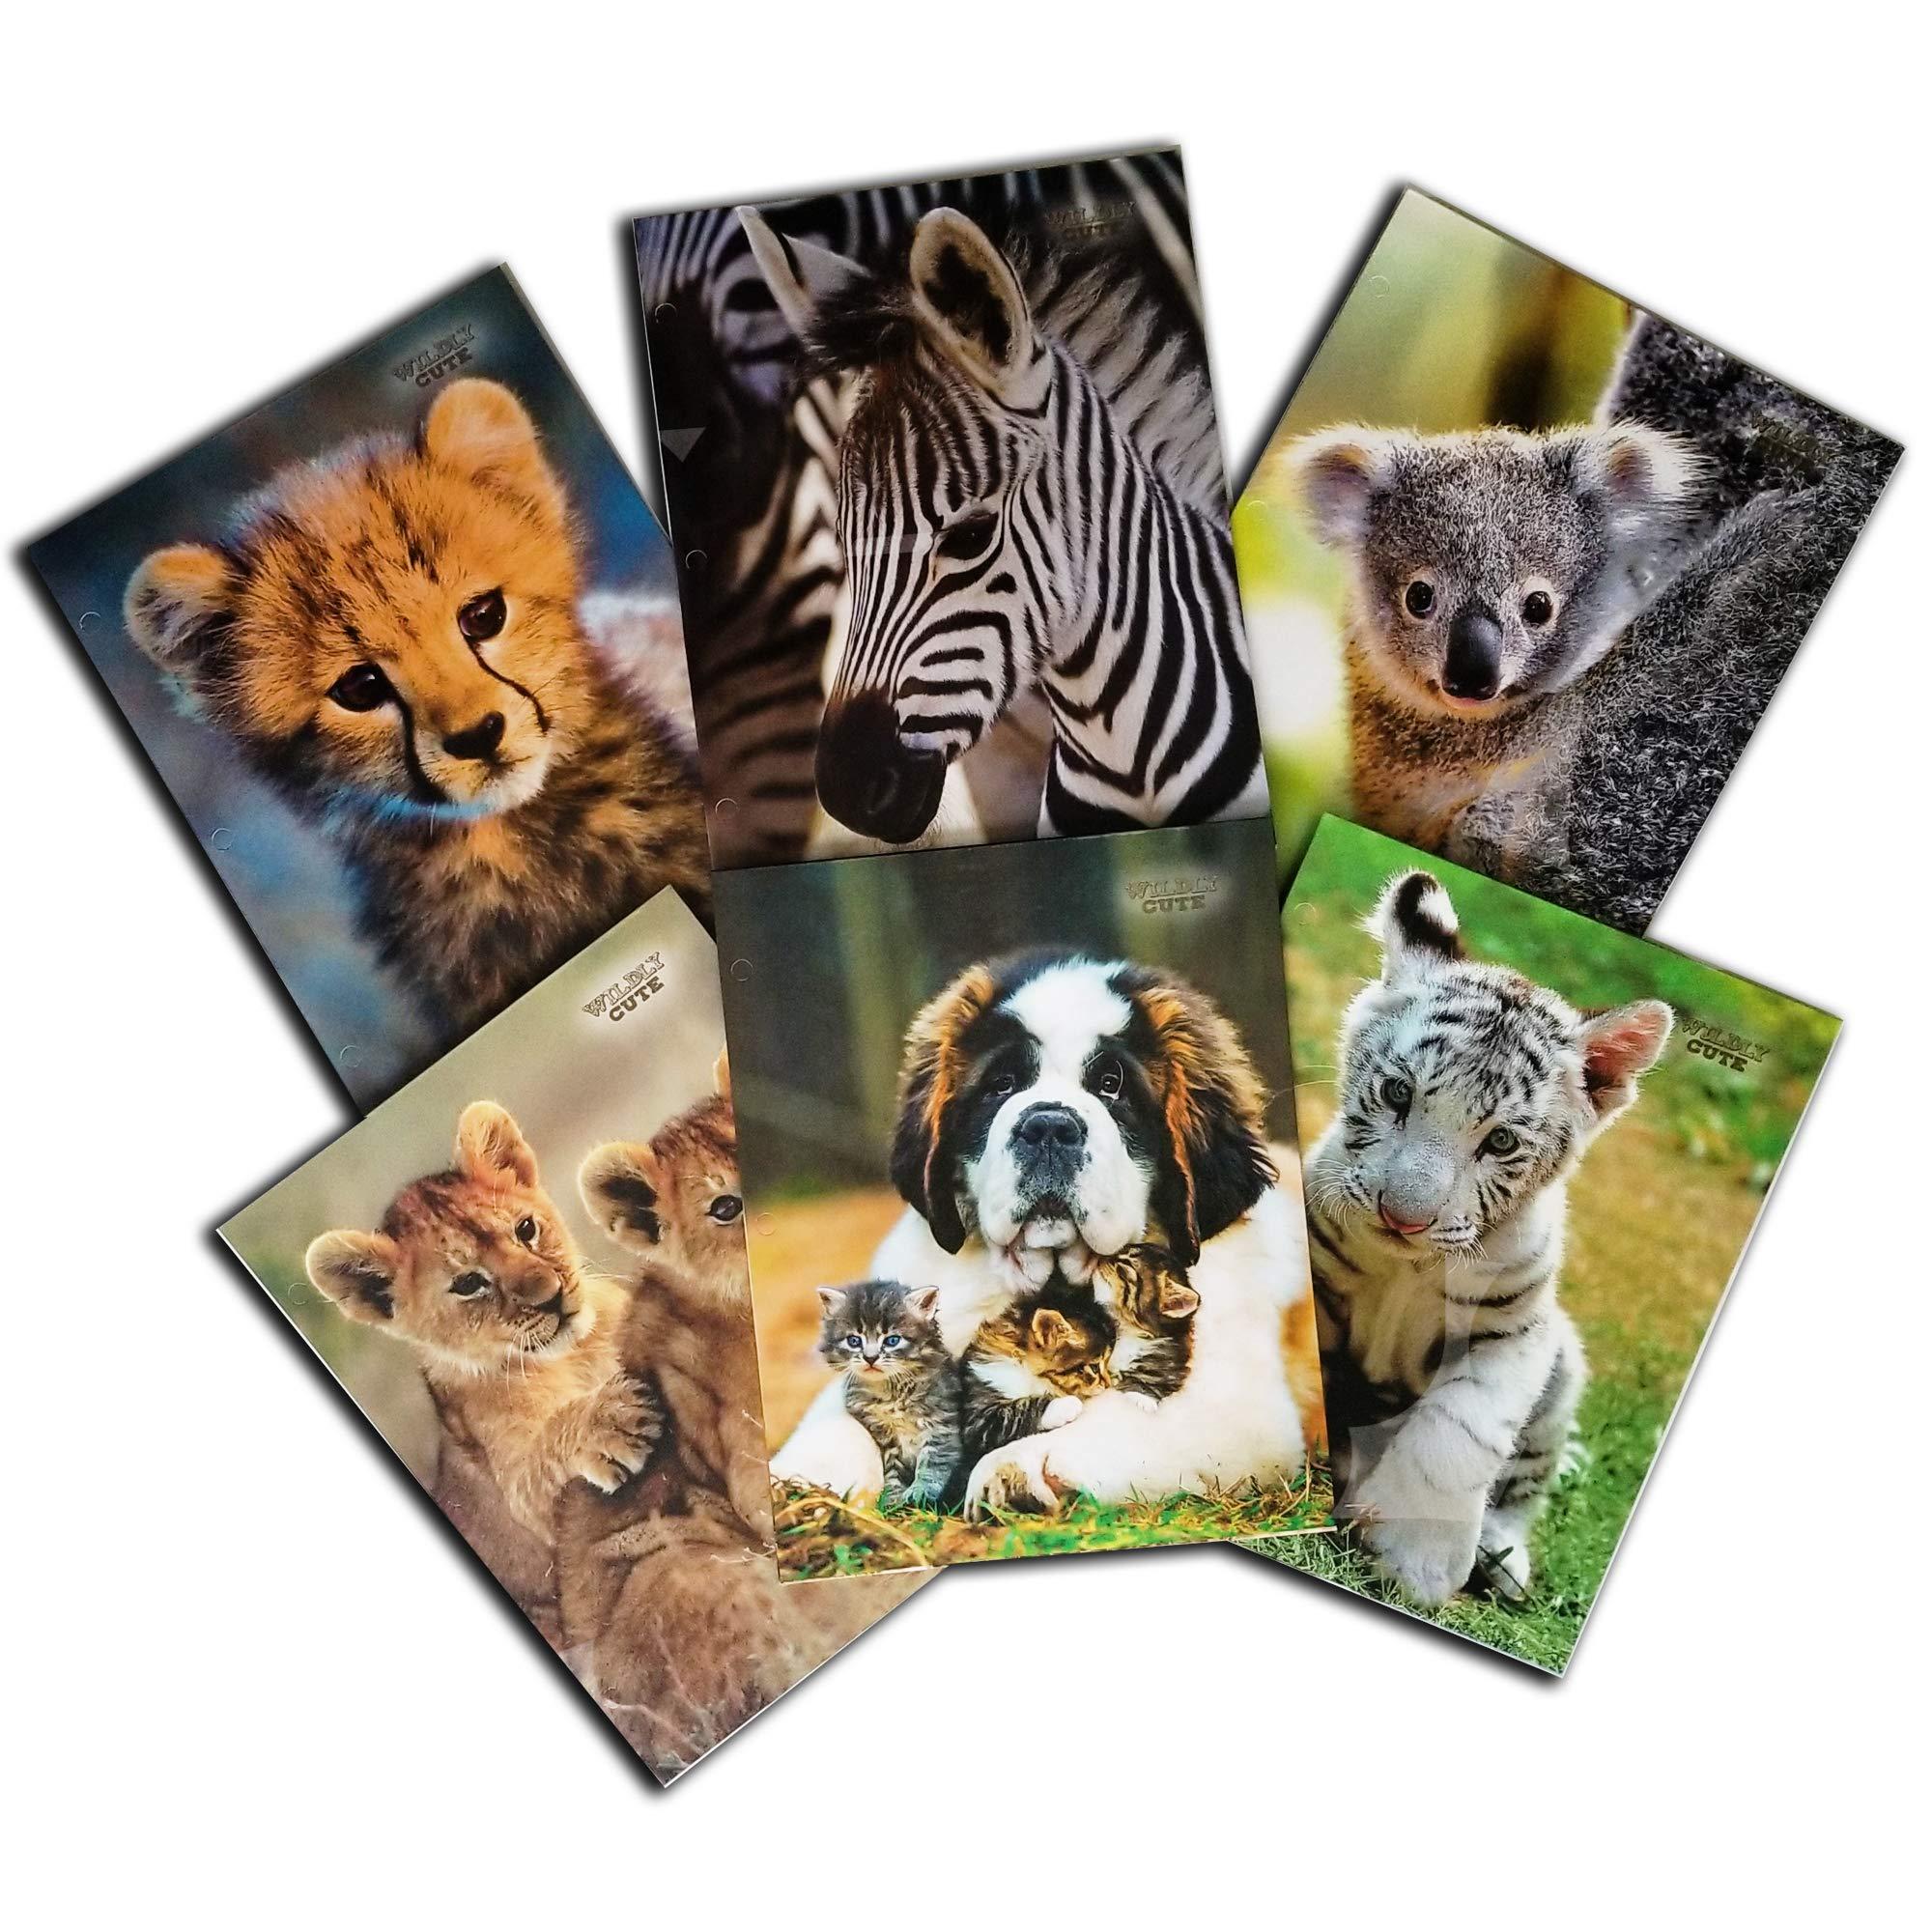 Cute N Cuddly School Folders - Back to School Supplies - 6 School Folder Variety Includes - Lion Cubs, Cheetah Cub, Tiger Cub, Dog and Kitties, Koala, and Zebra